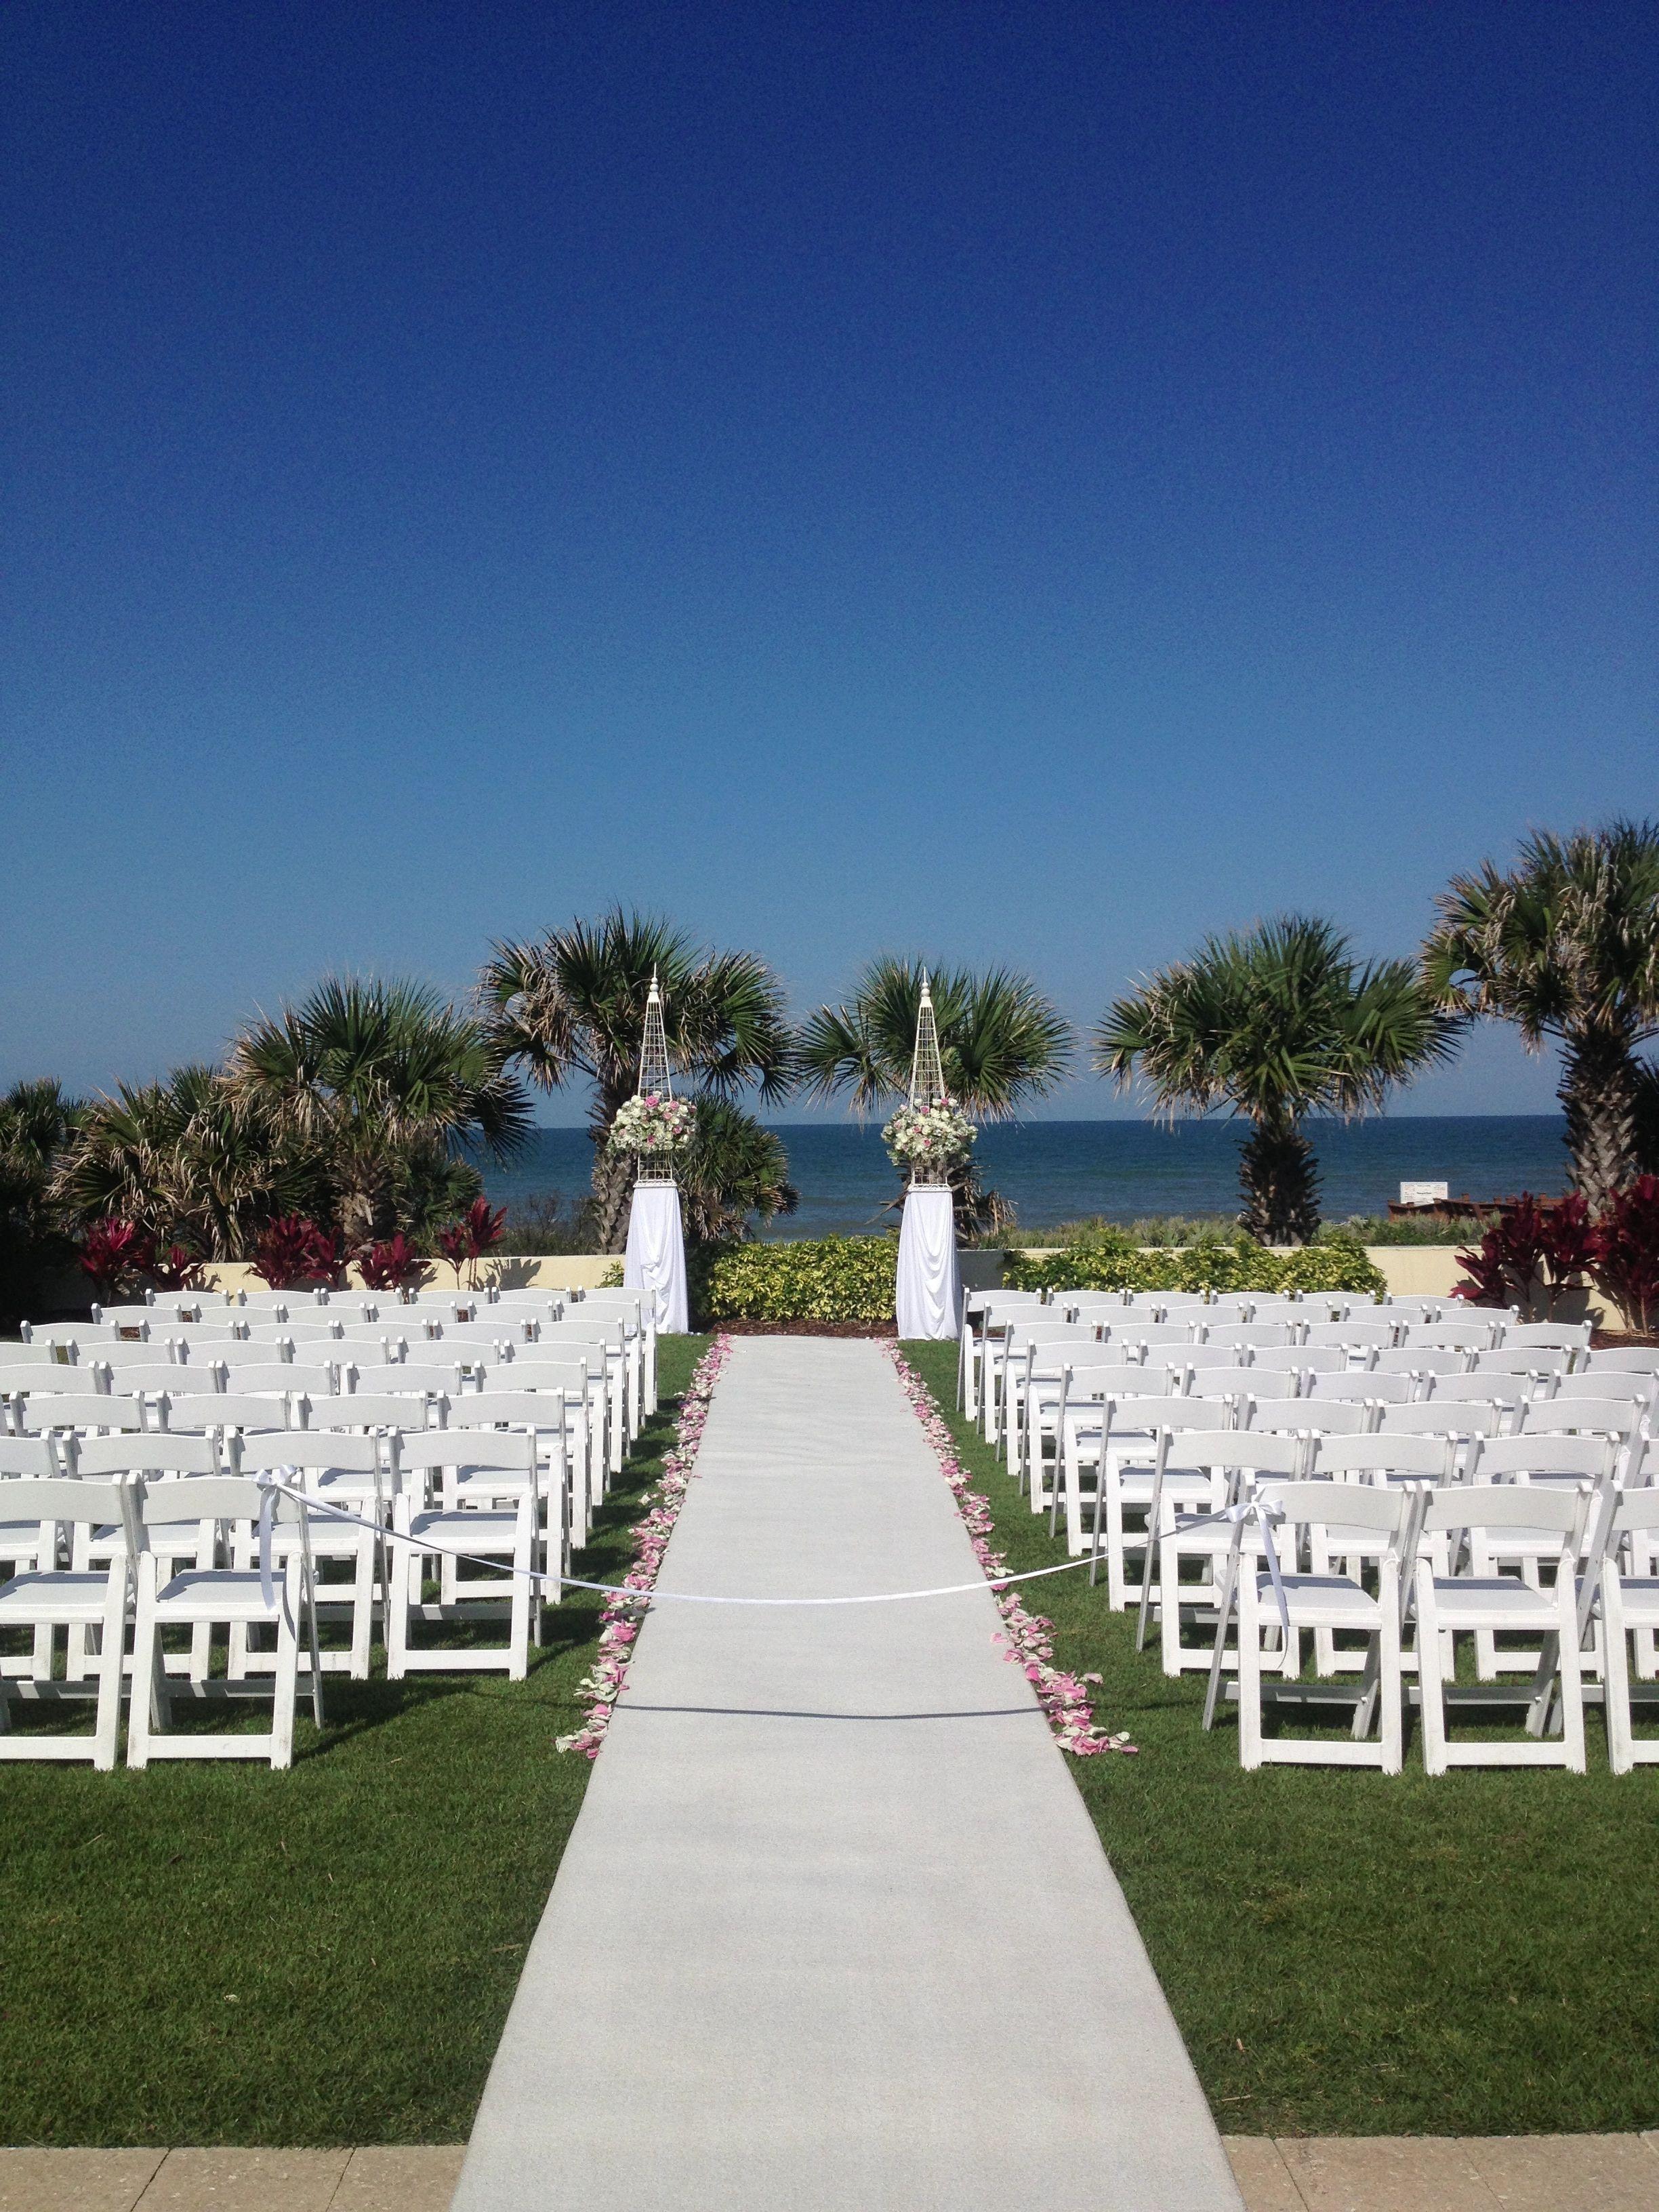 Wedding Ceremony On Lodge Event Lawn At Hammock Beach Resort